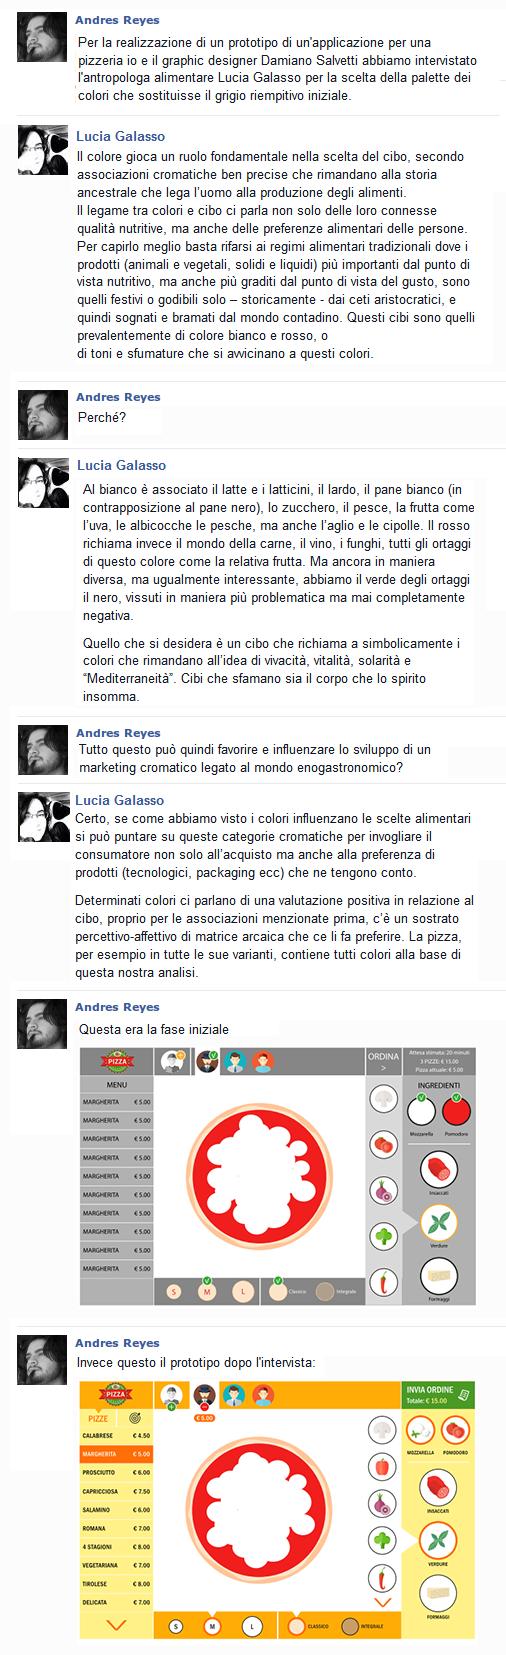 lucia_galasso